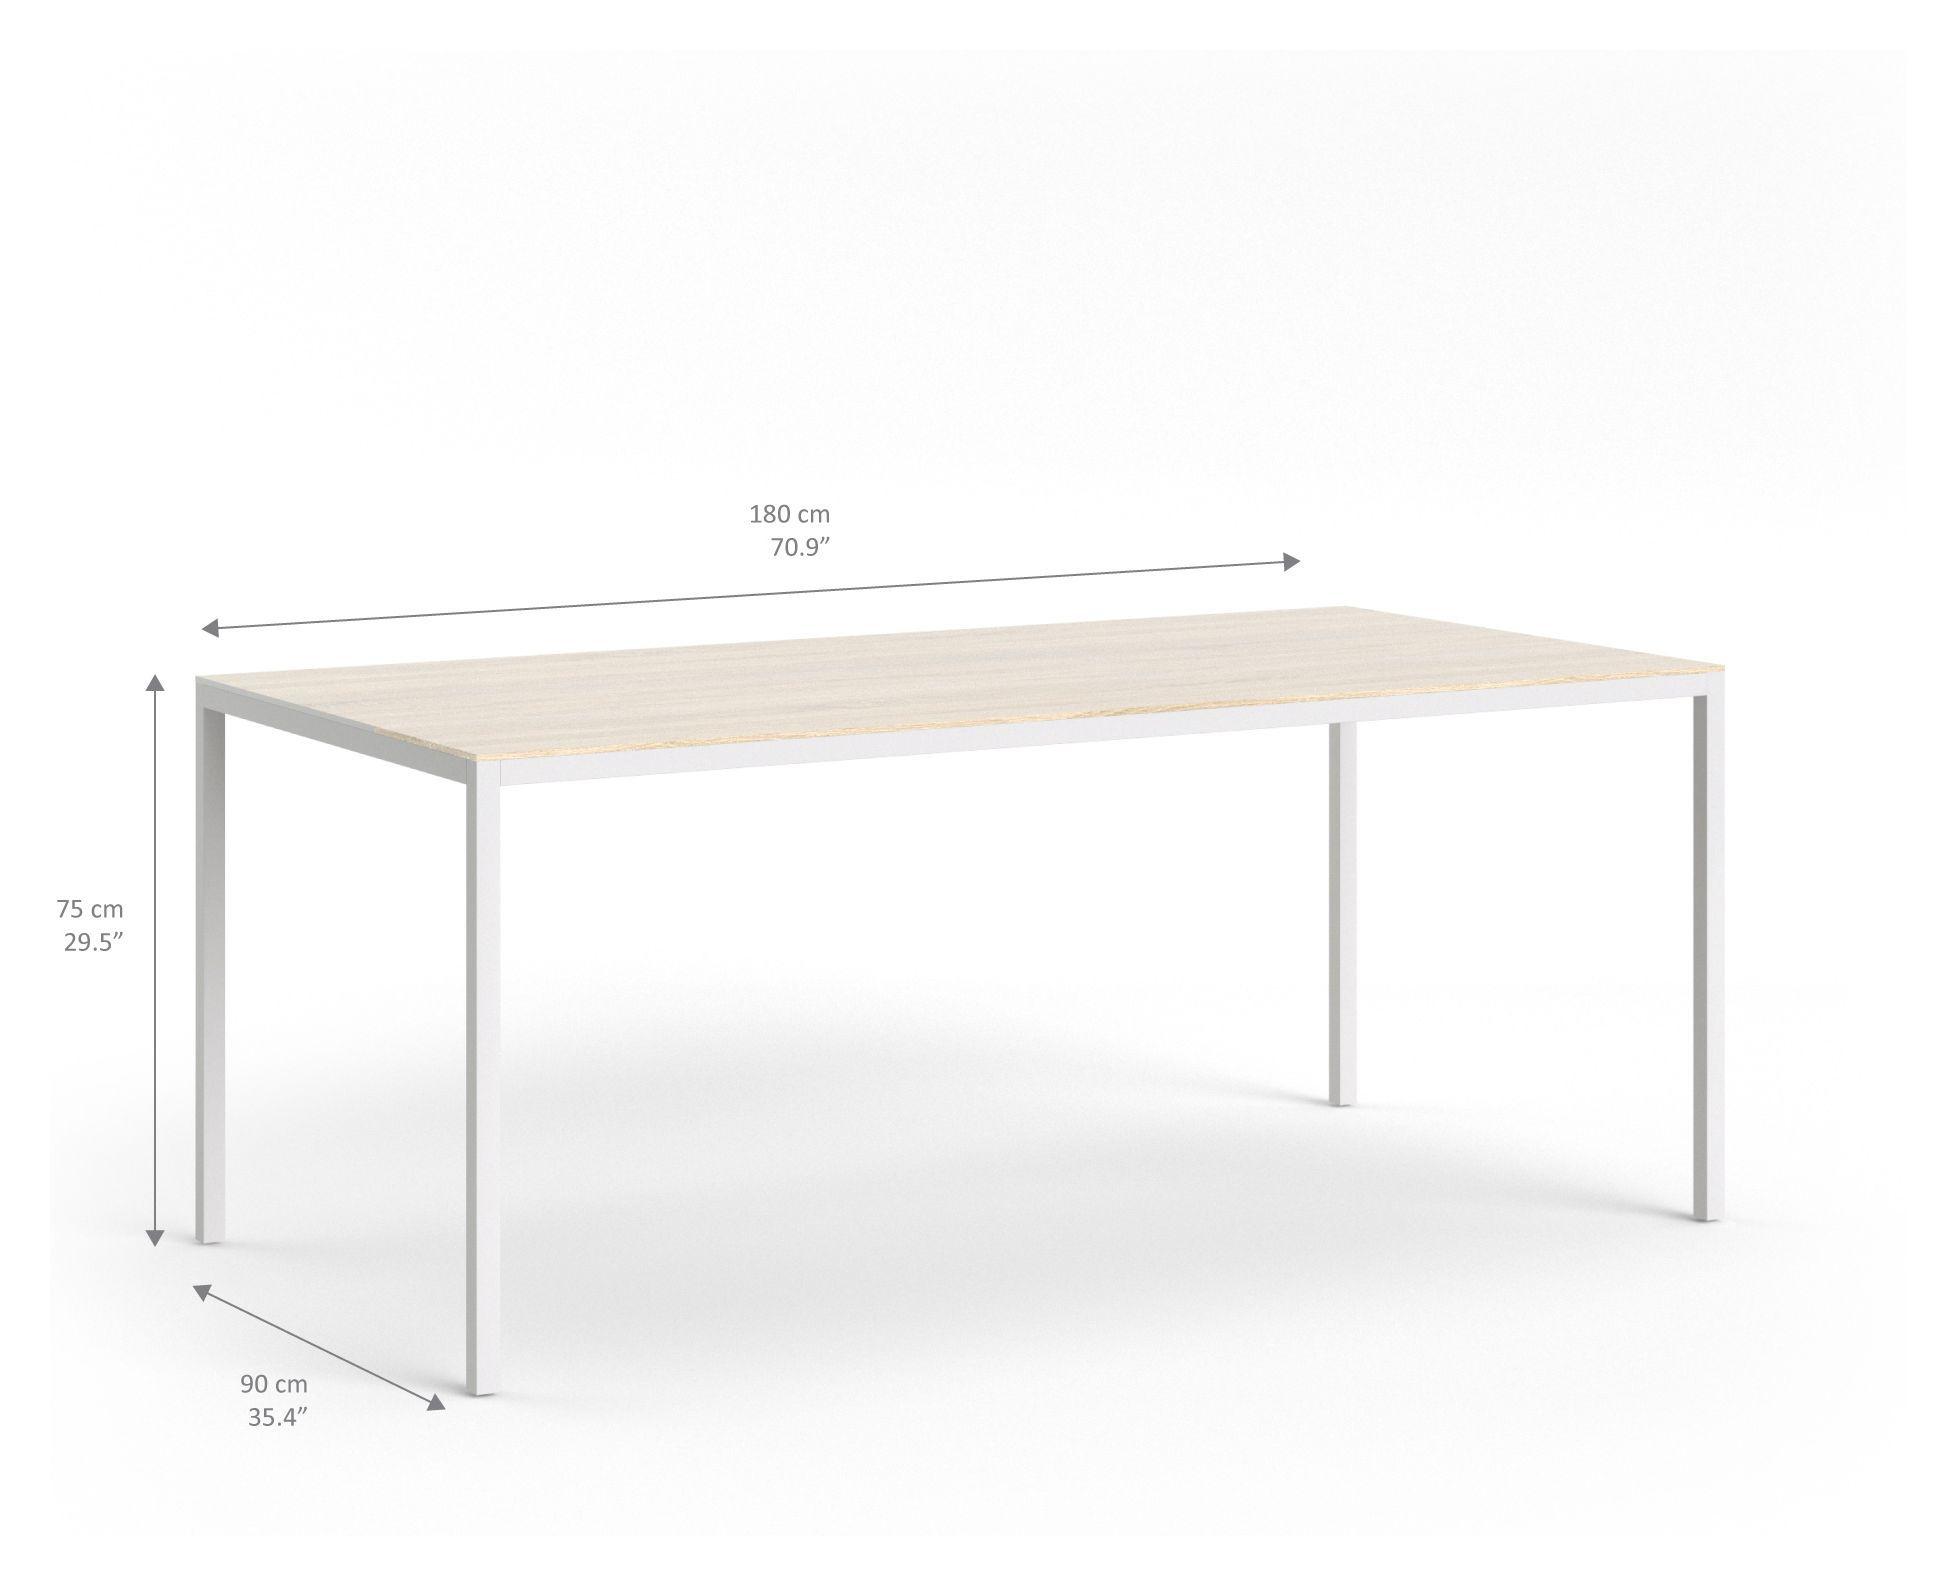 Family Spisebord 180x90 - Laminat